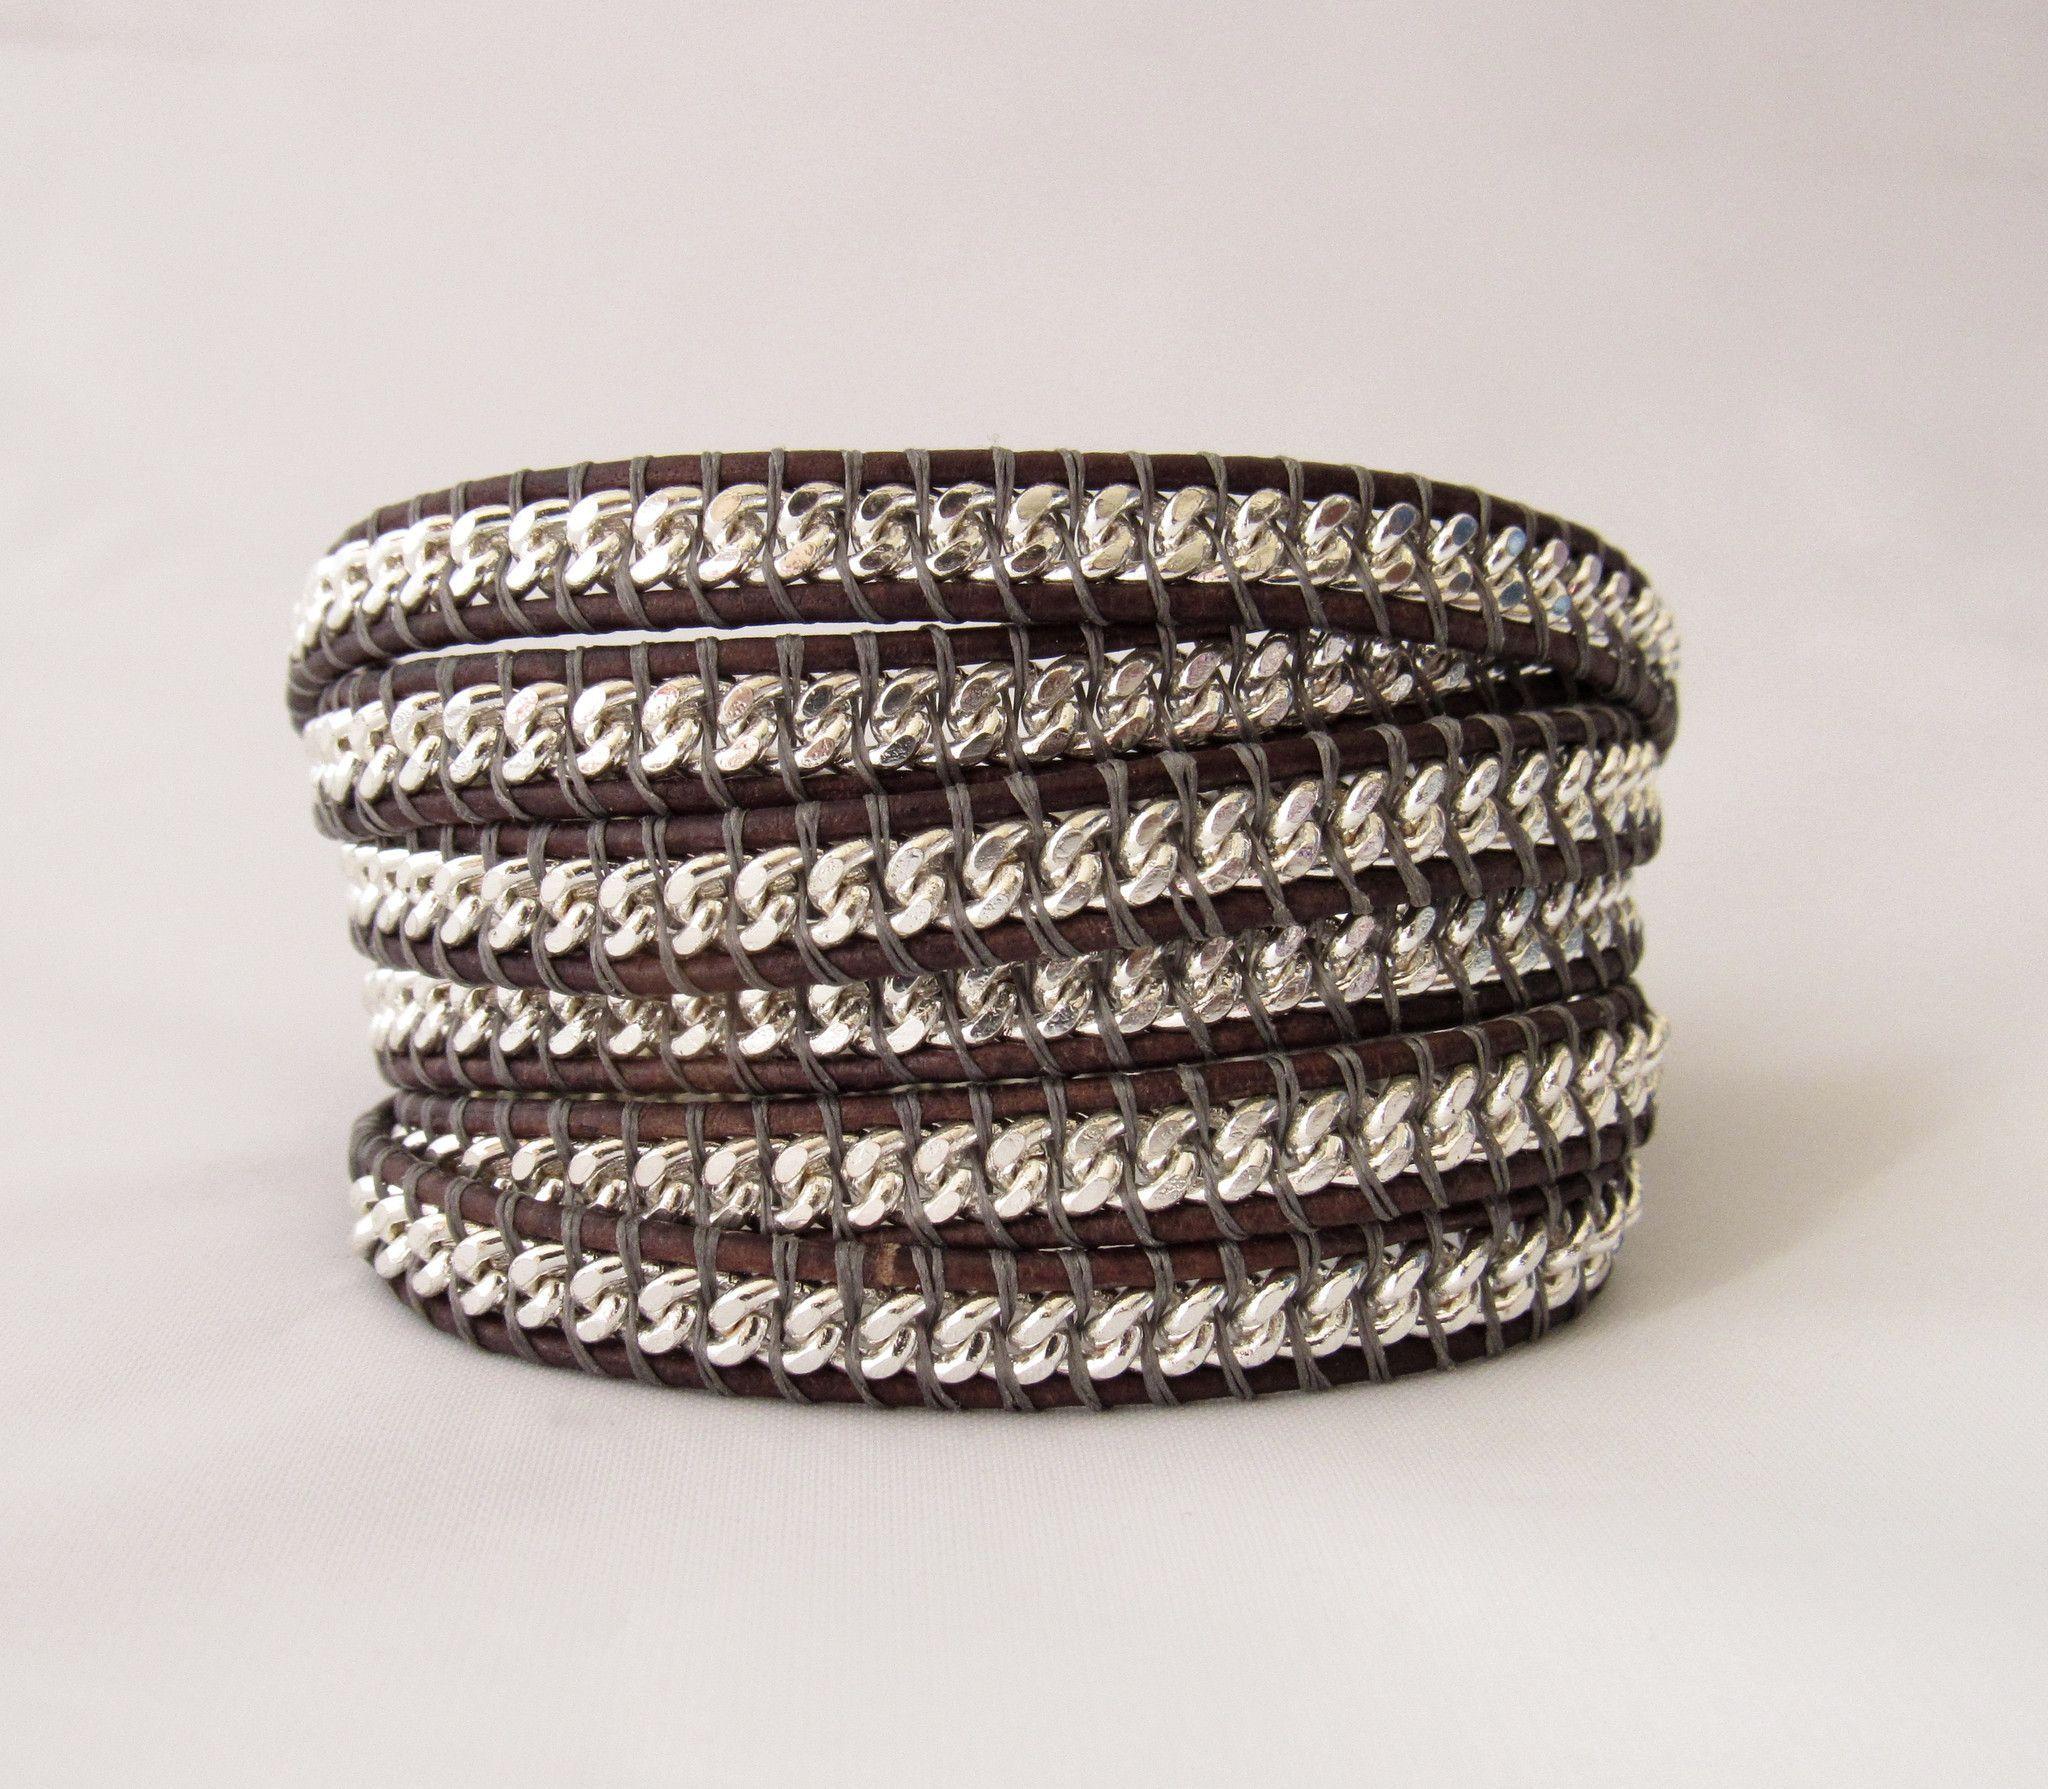 Durango Silver Chain Leather Wrap